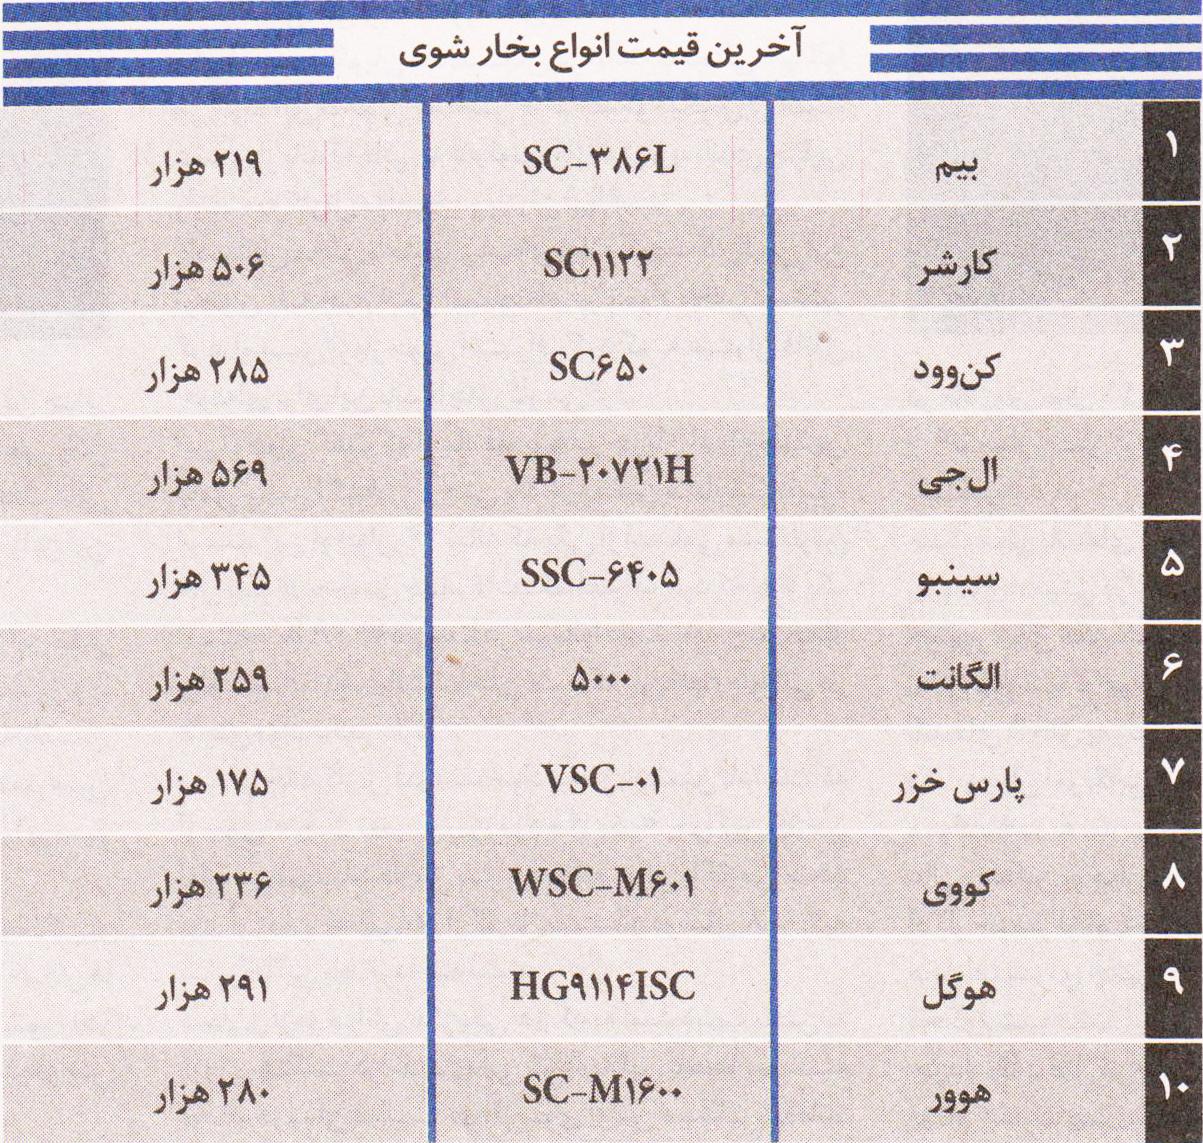 قیمت گاز خانه